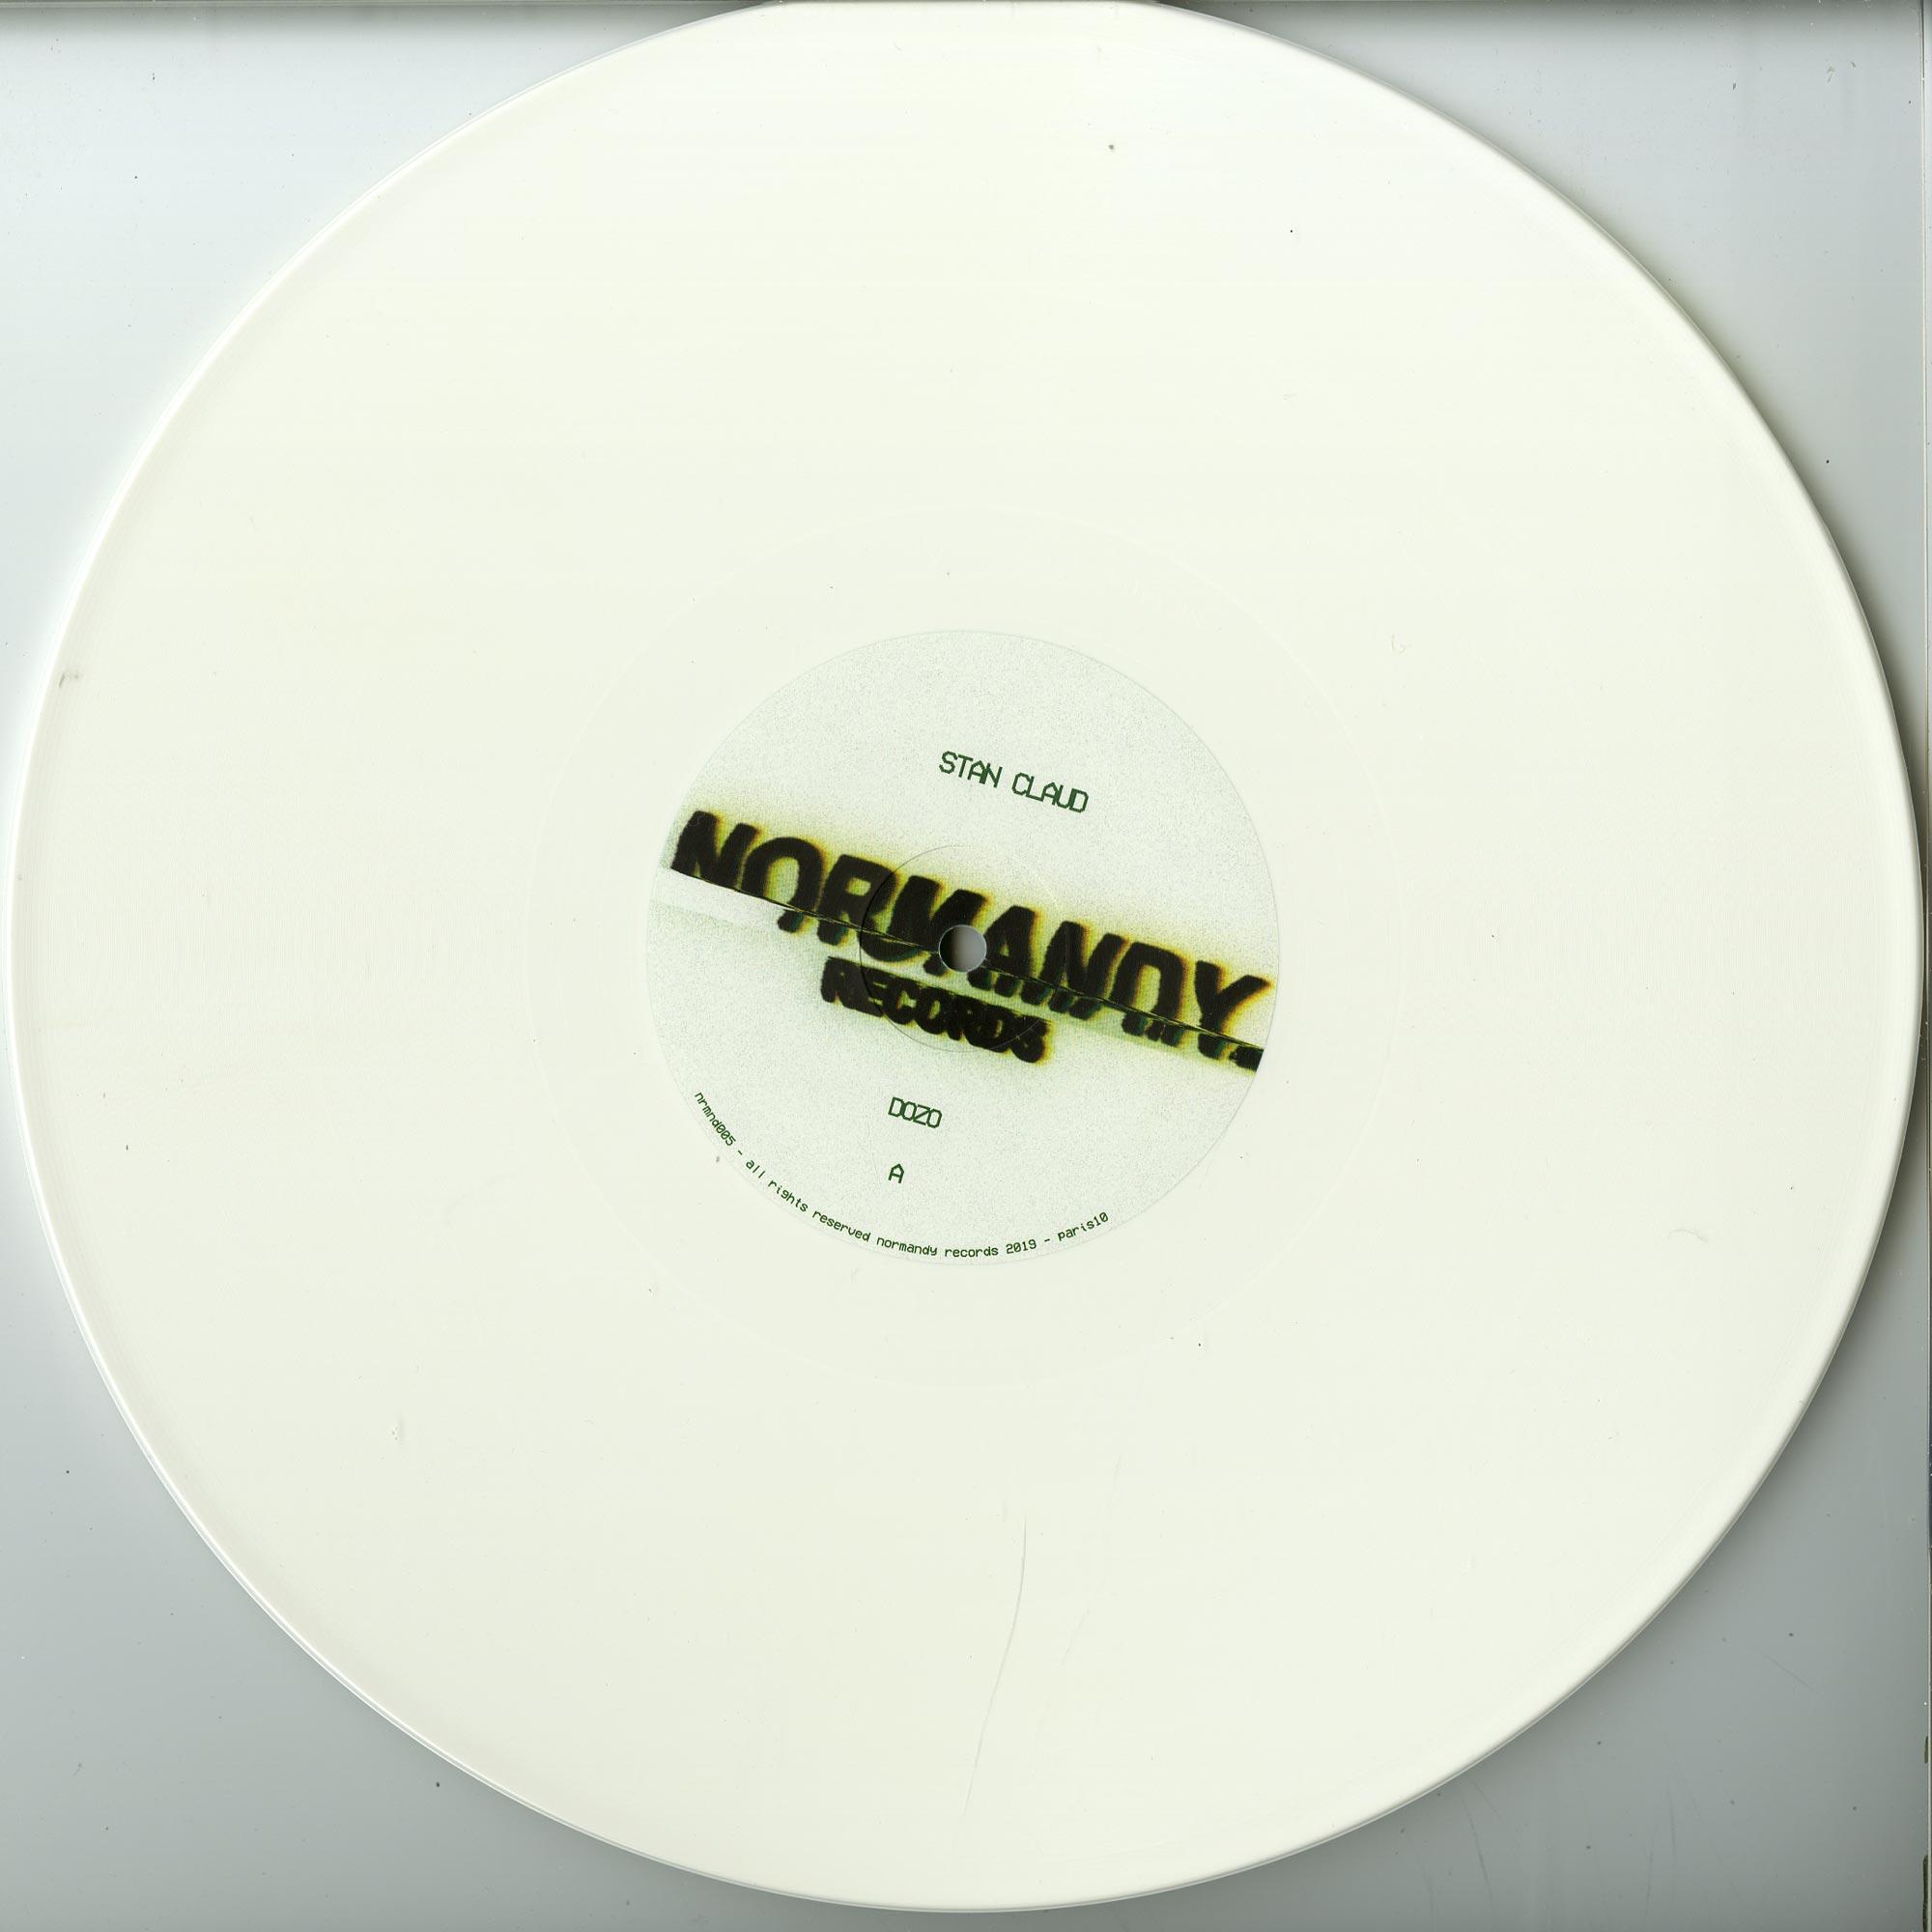 Stan Claud - NRMND005 EP